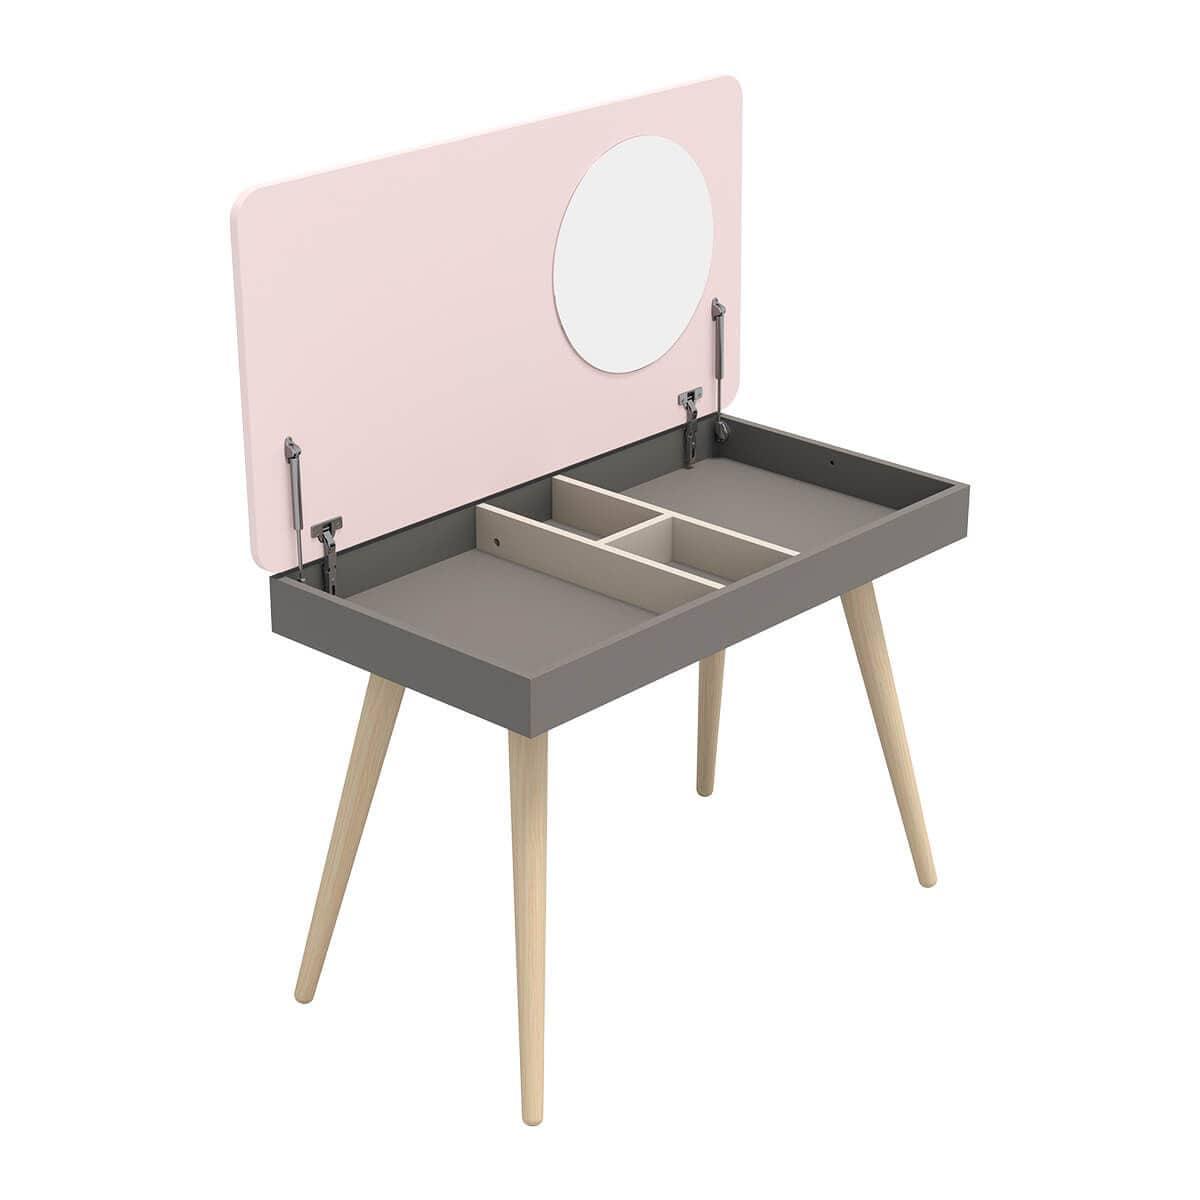 Wooden Desk Contemporary With Storage Child S Secret